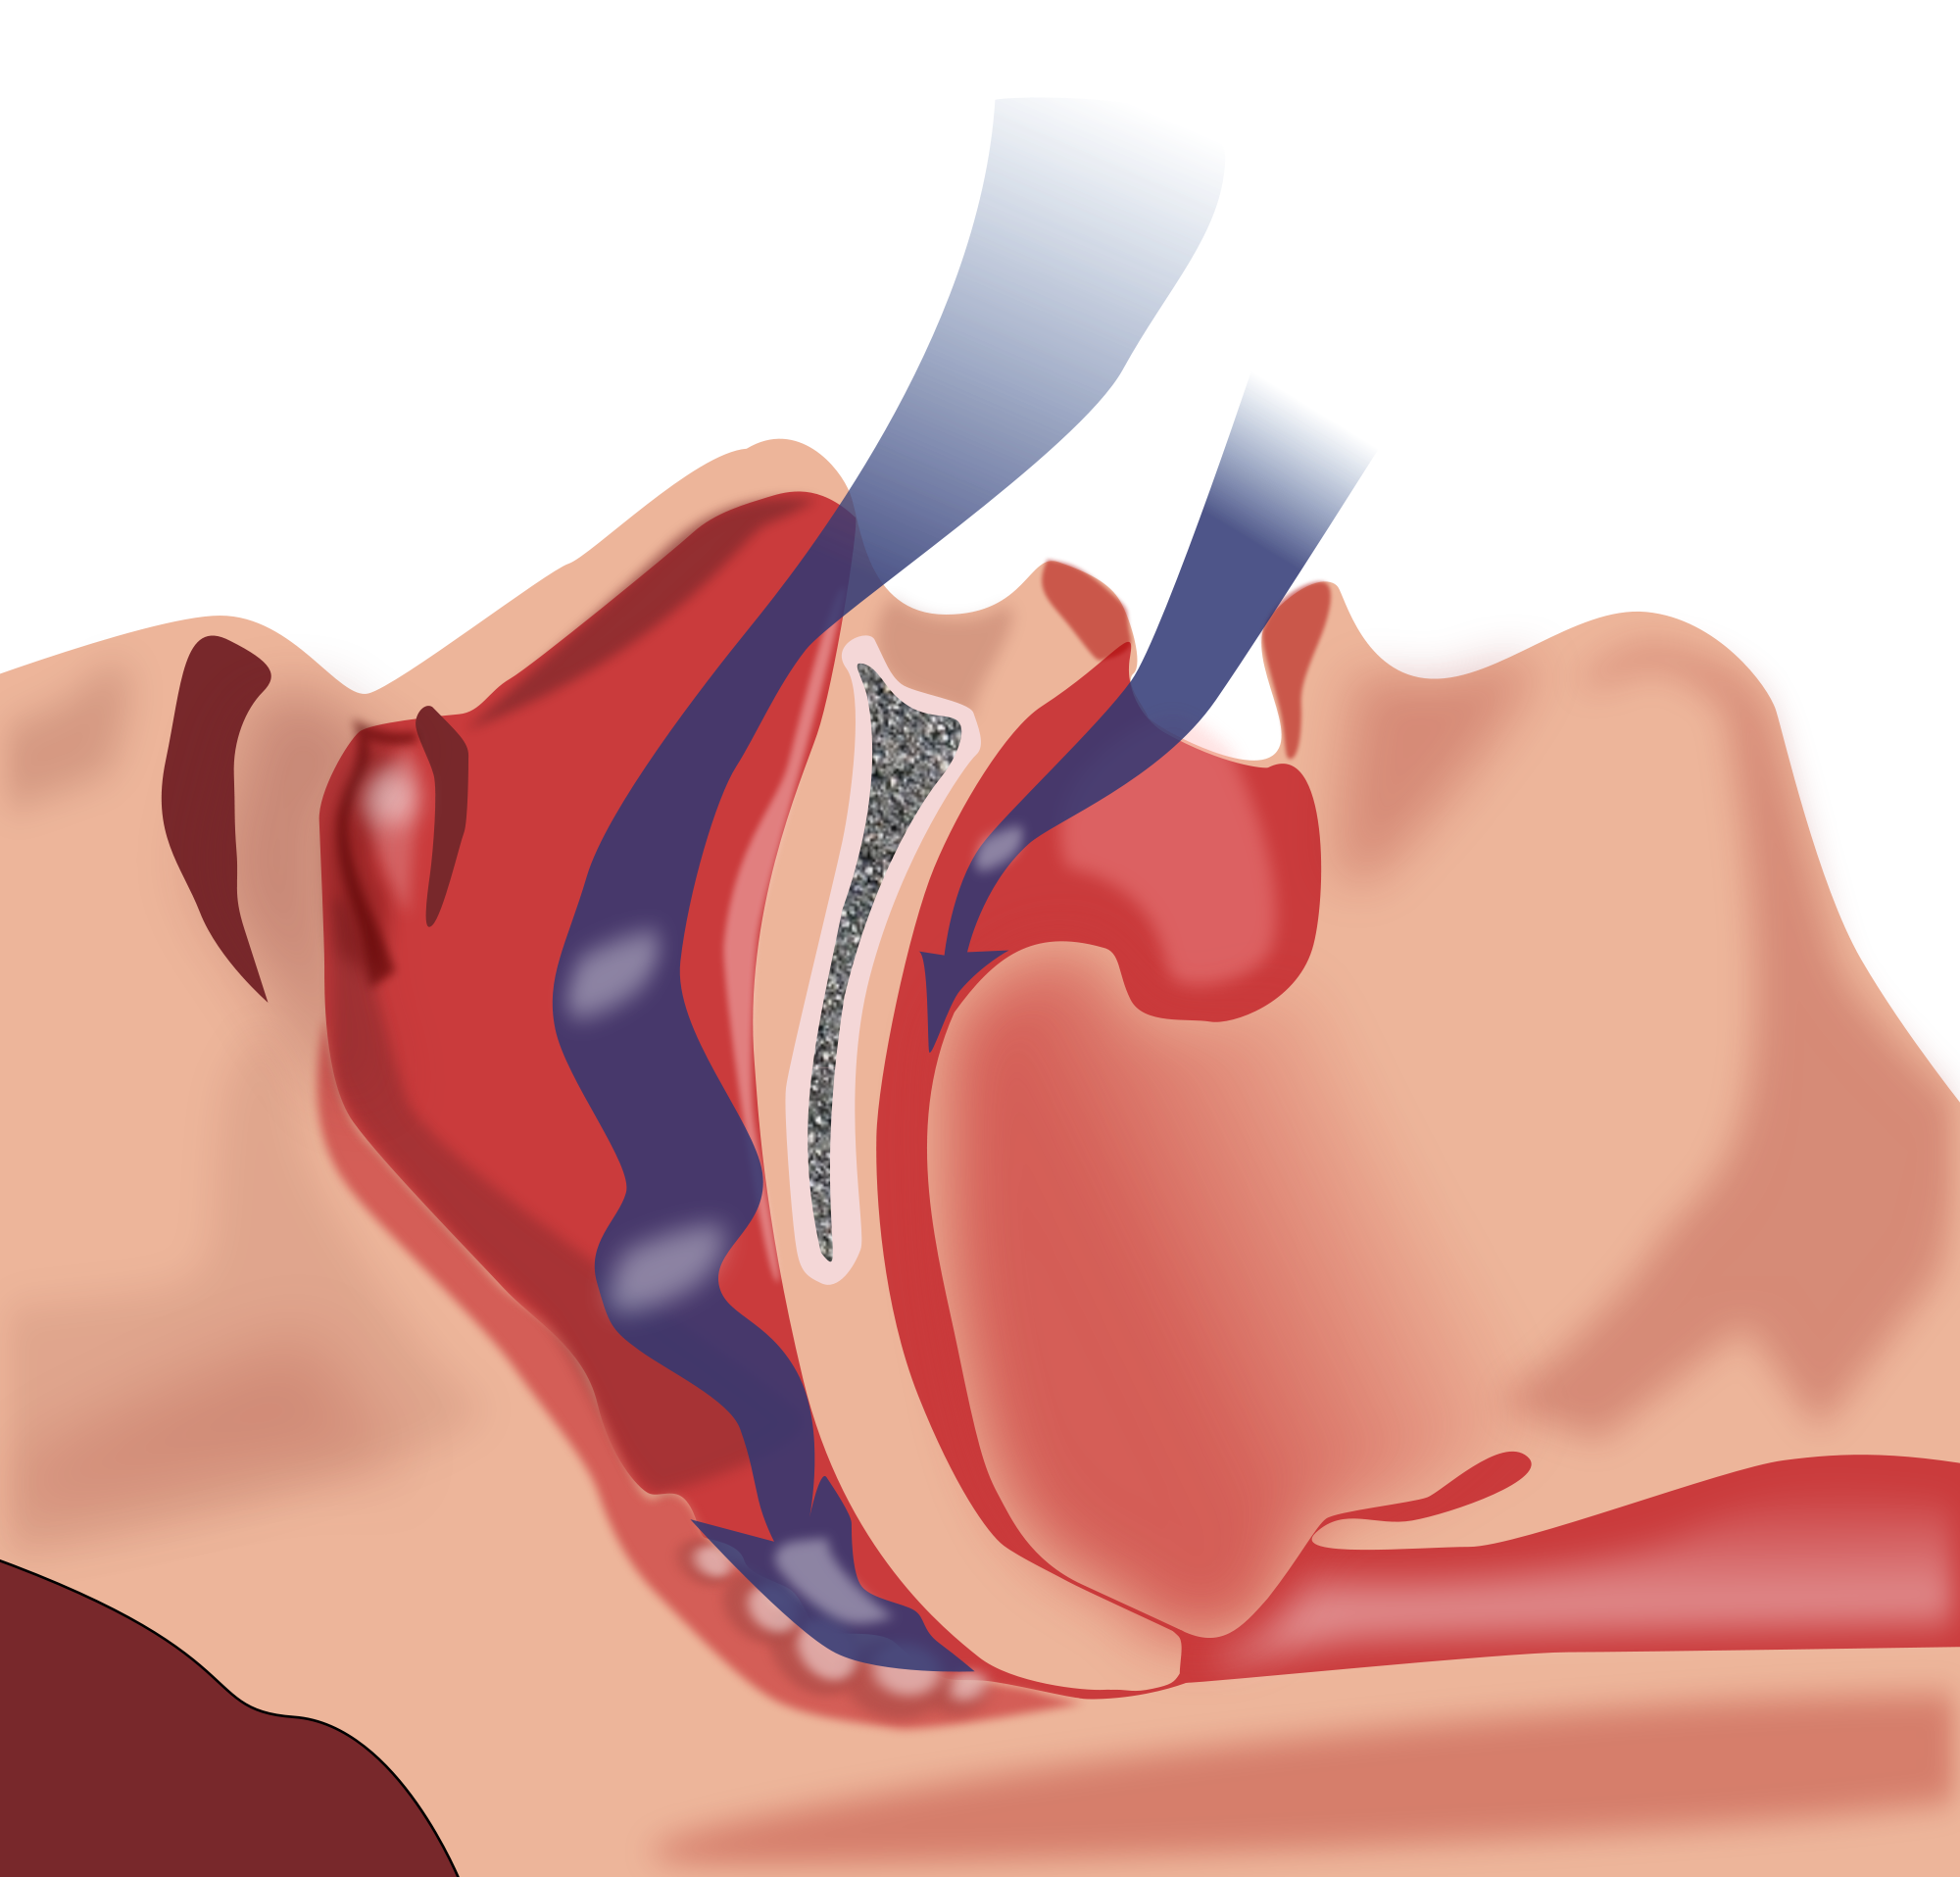 Sleep Apnea type 2 diabetes